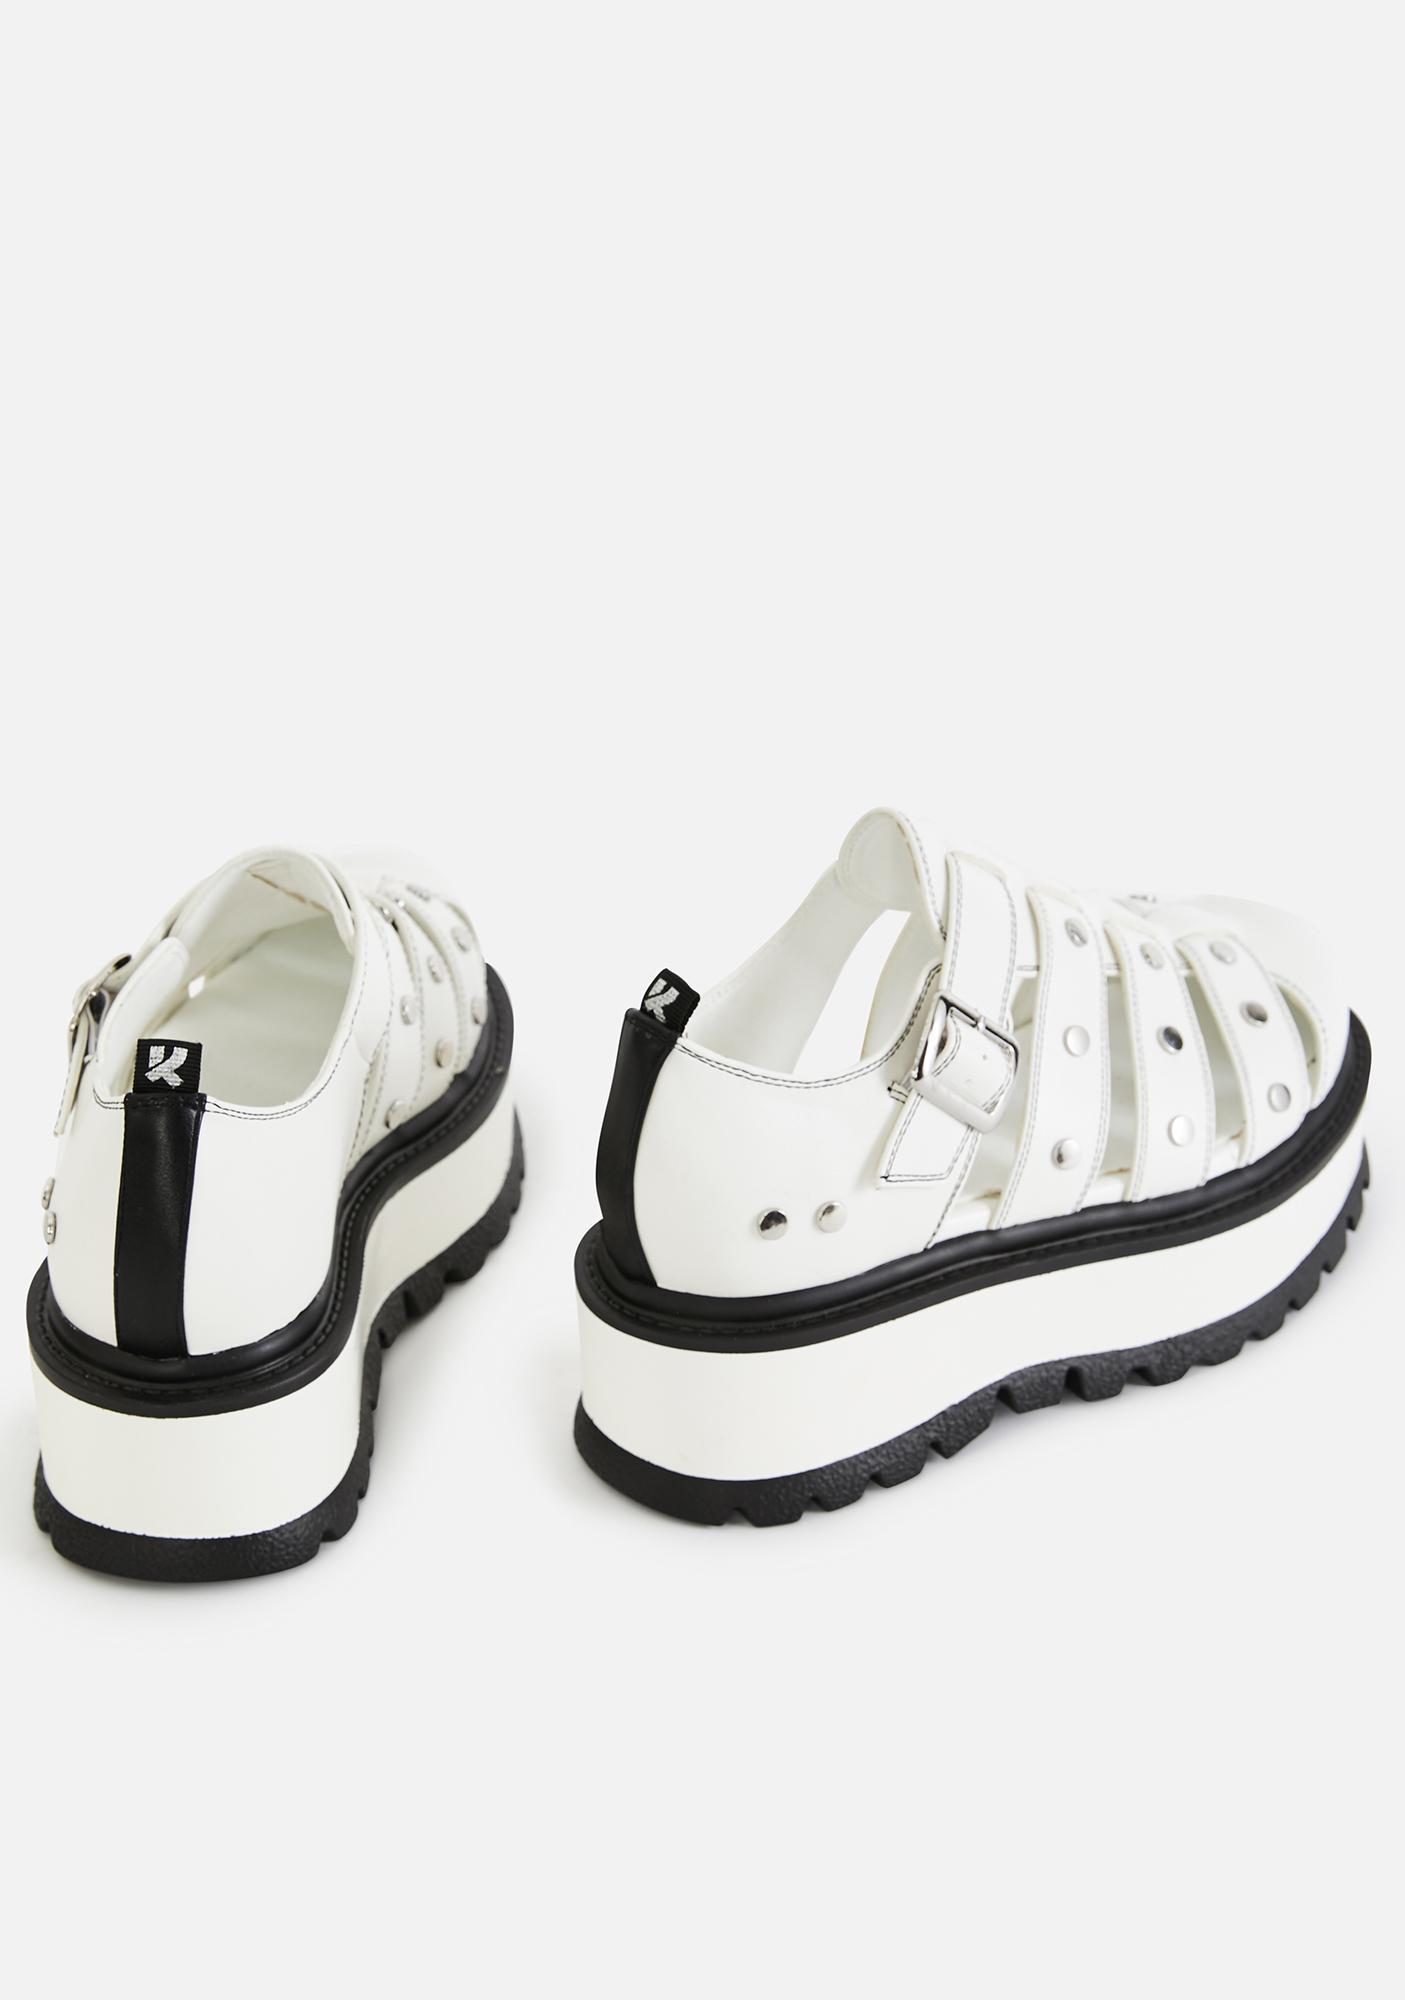 Koi Footwear Relay Platform Sandals